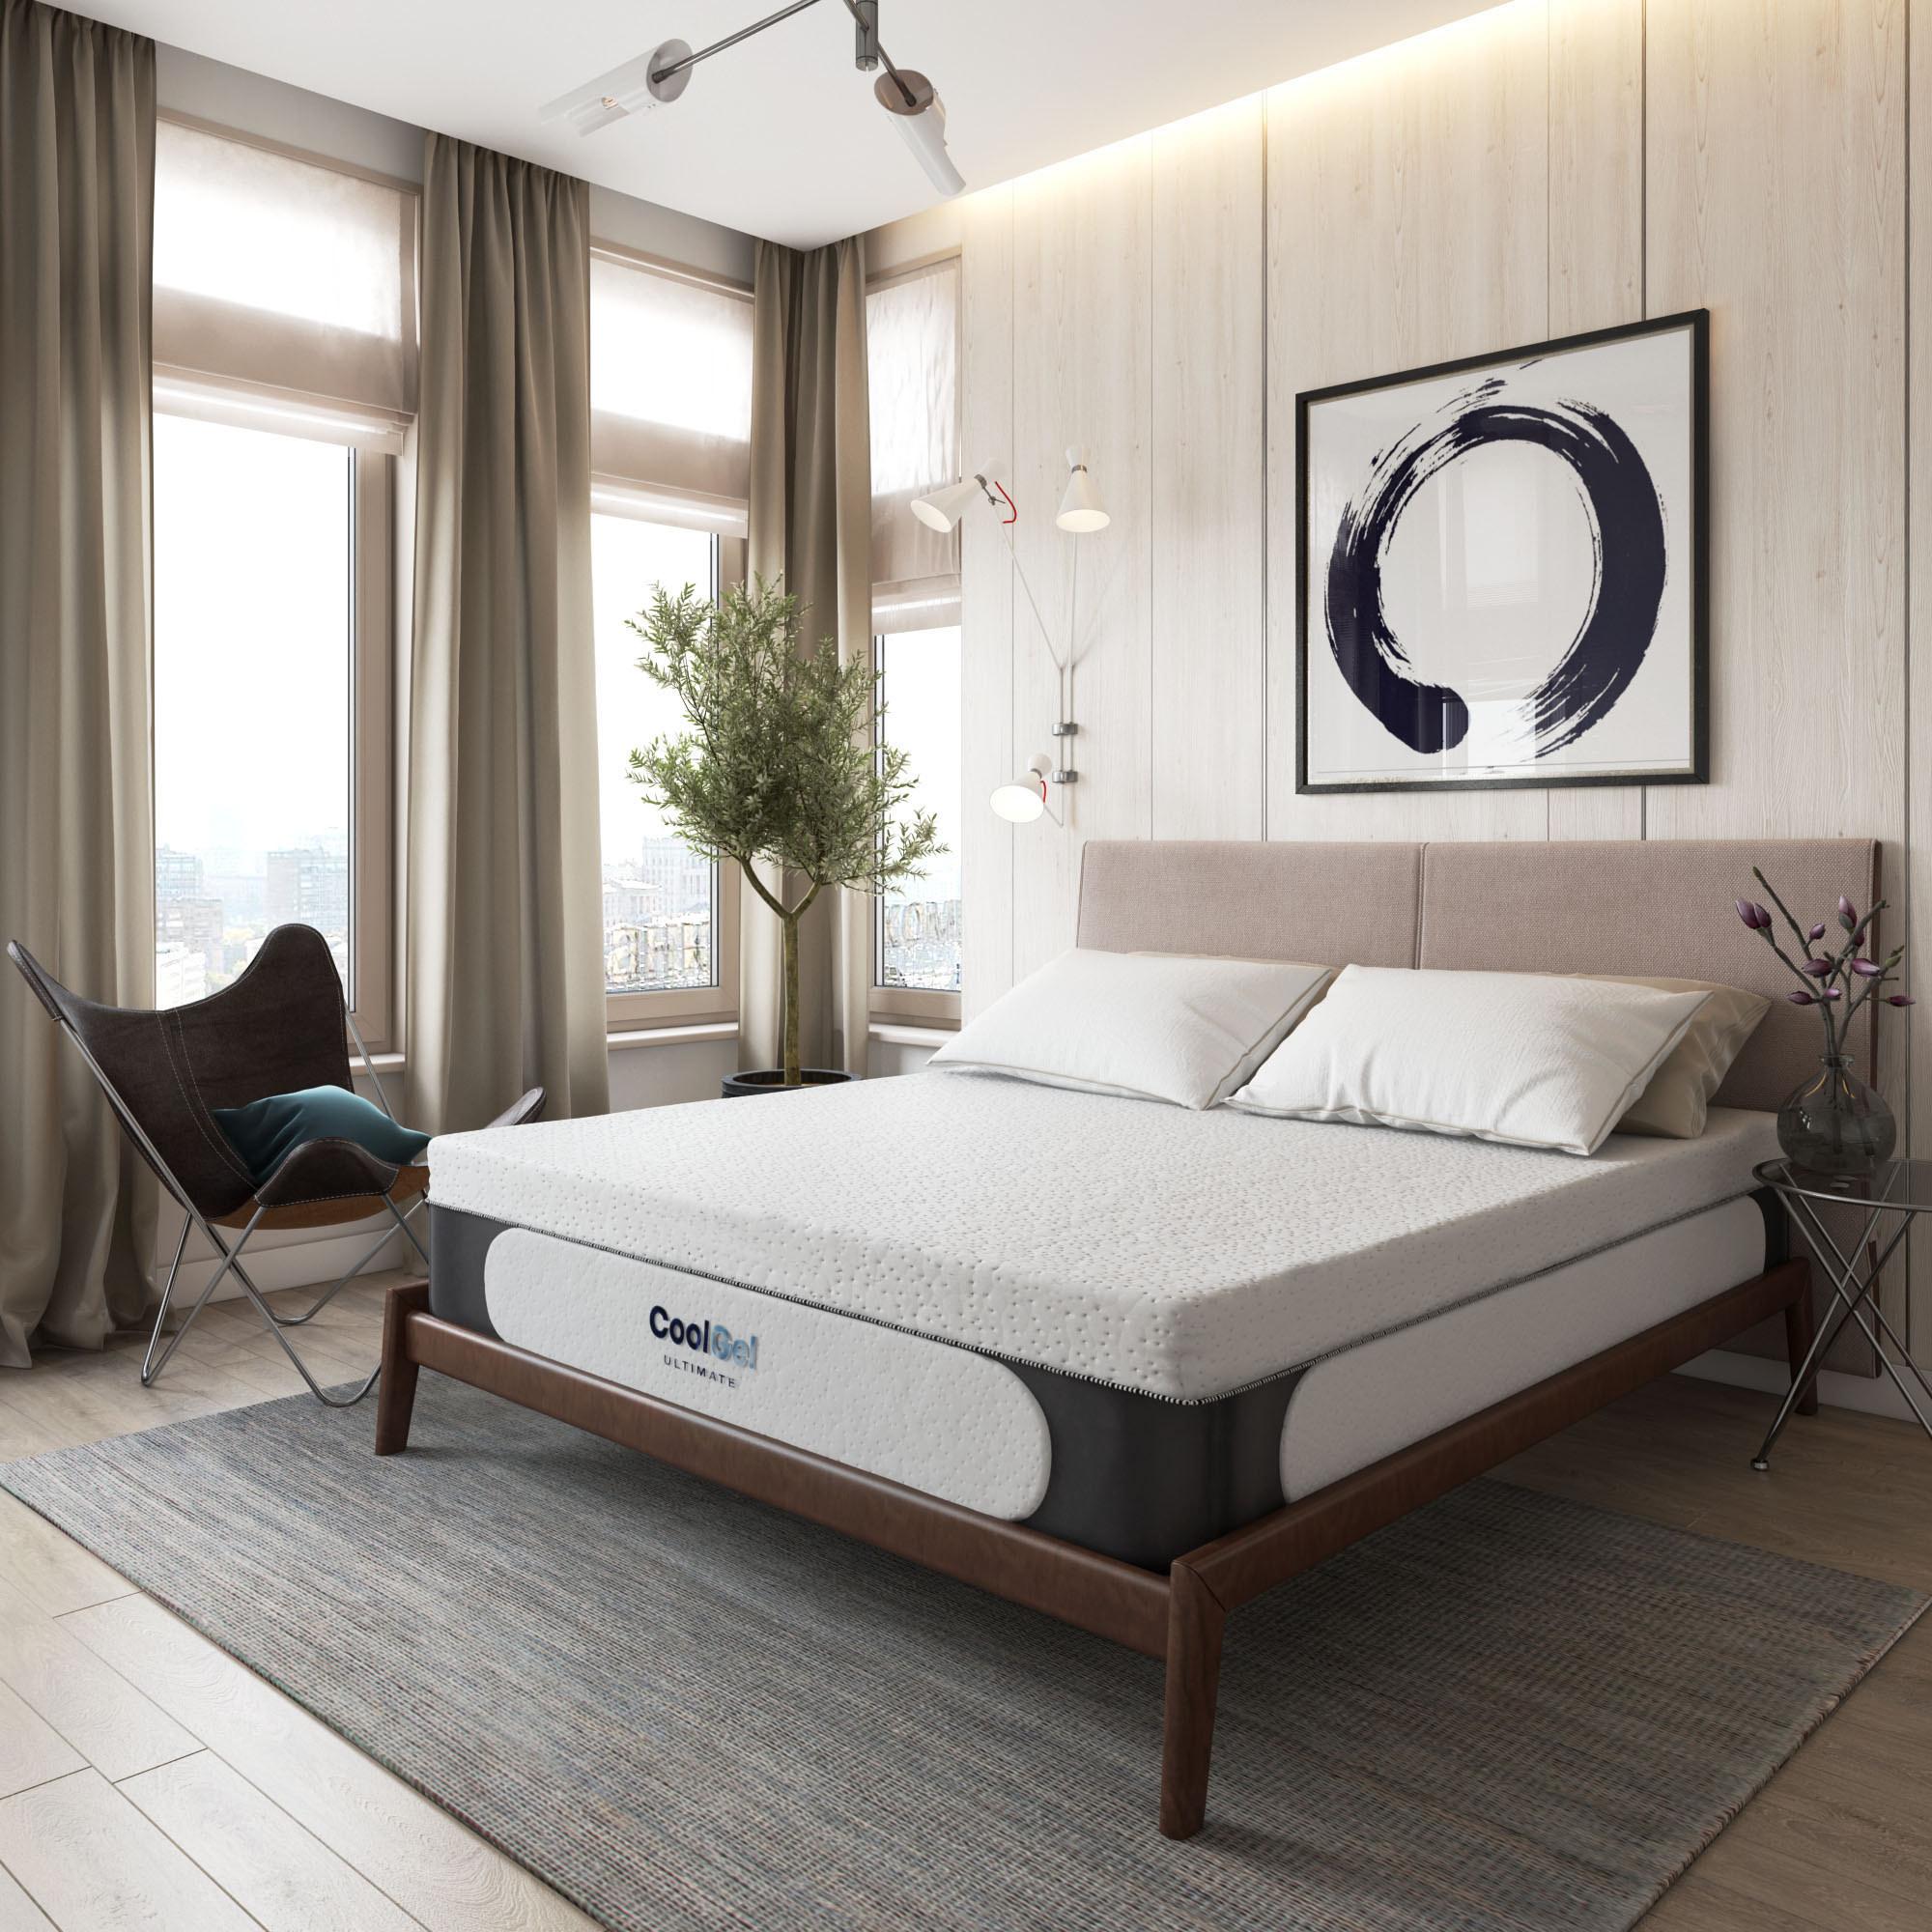 cool gel memory foam mattress with pillows on top